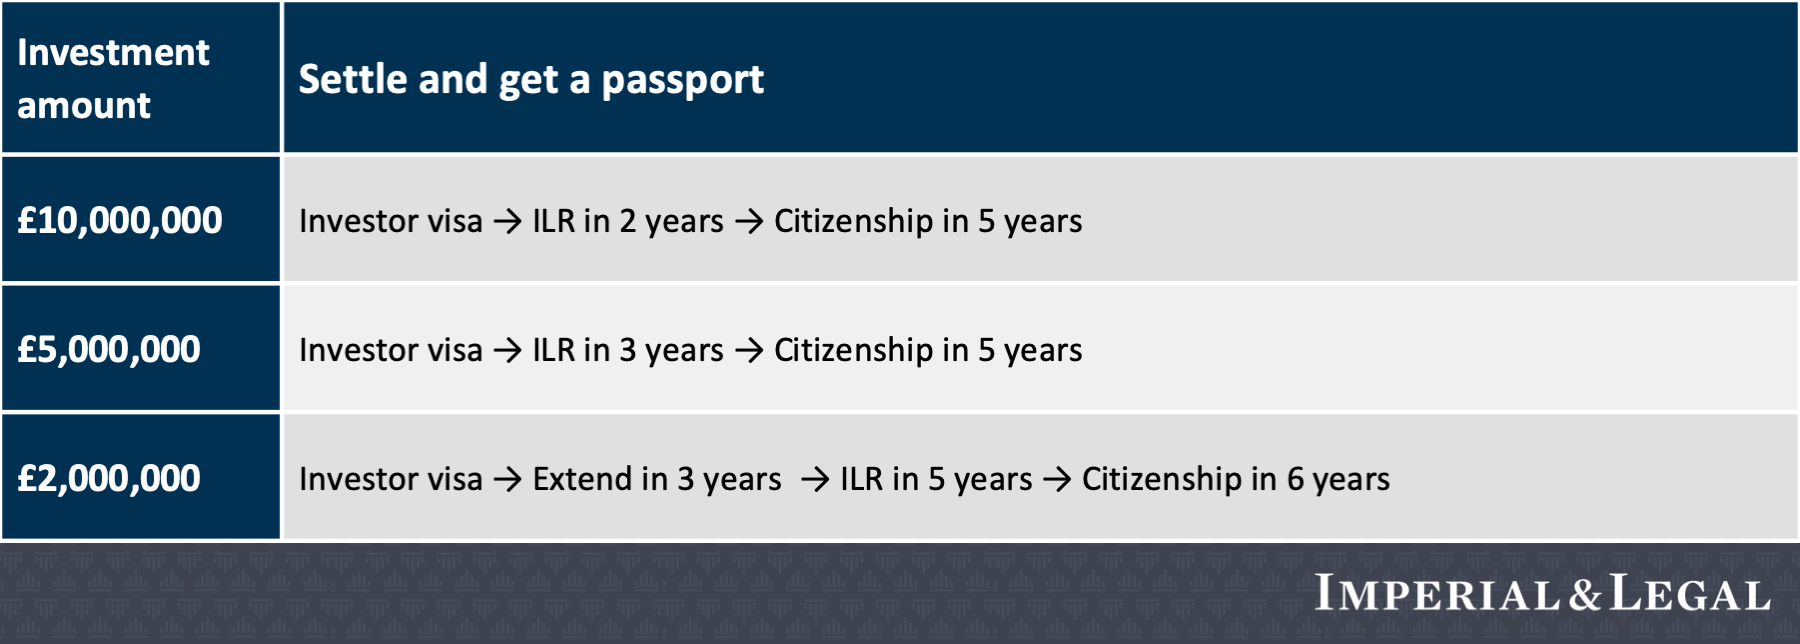 Tier 1 Investor visa. UK investor visa. How to get UK investor visa. Fastest visa to British passport. Invest and get Investor visa to the United Kingdom.